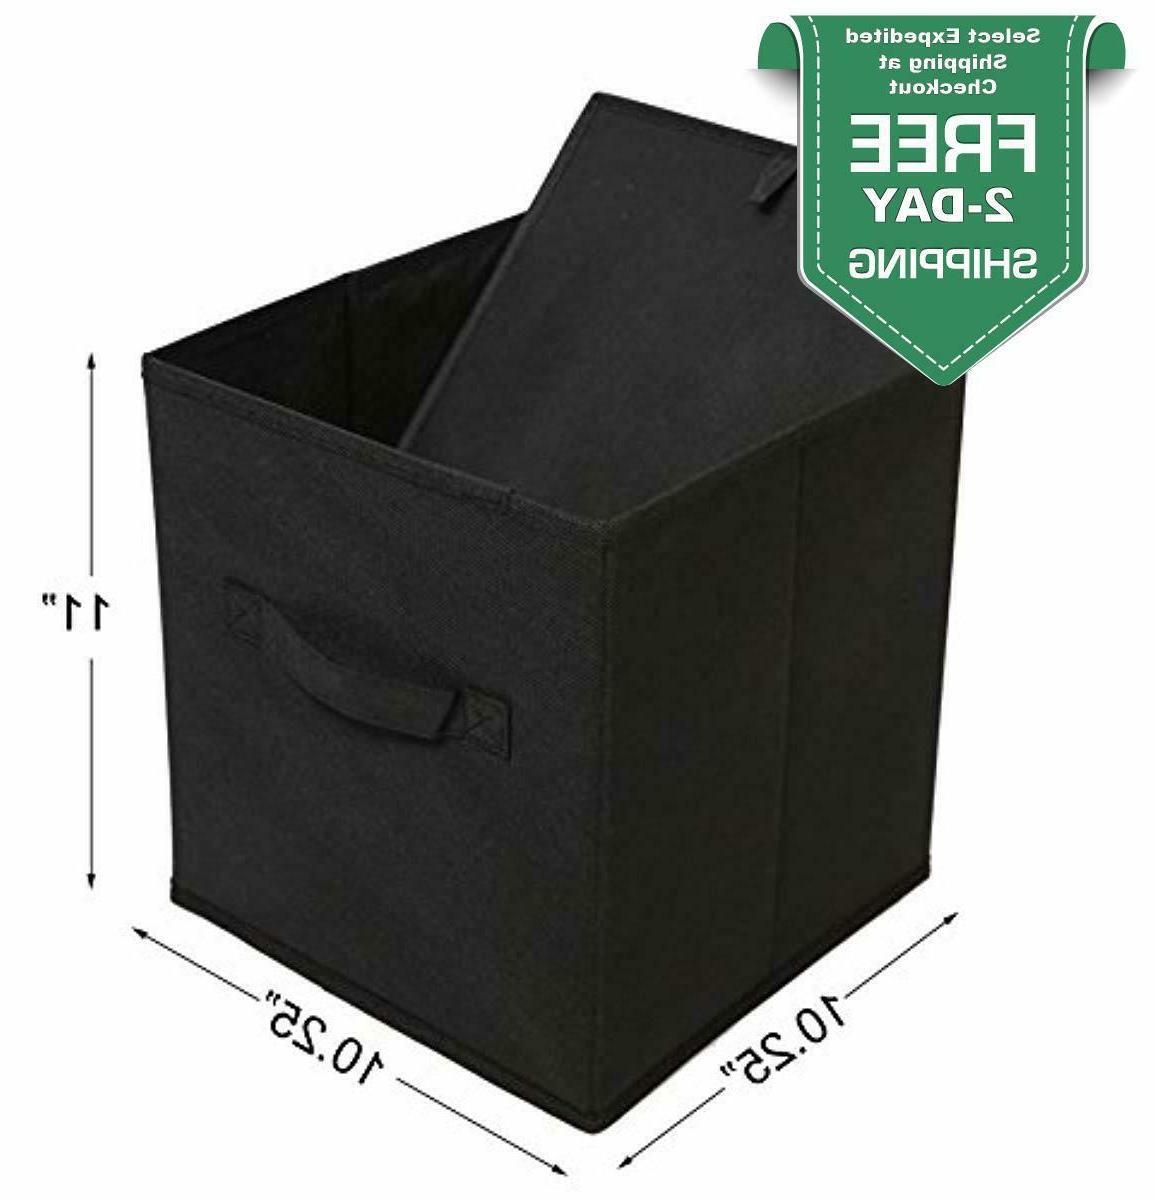 Foldable Storage Cubes Organizer Basket Collapsible